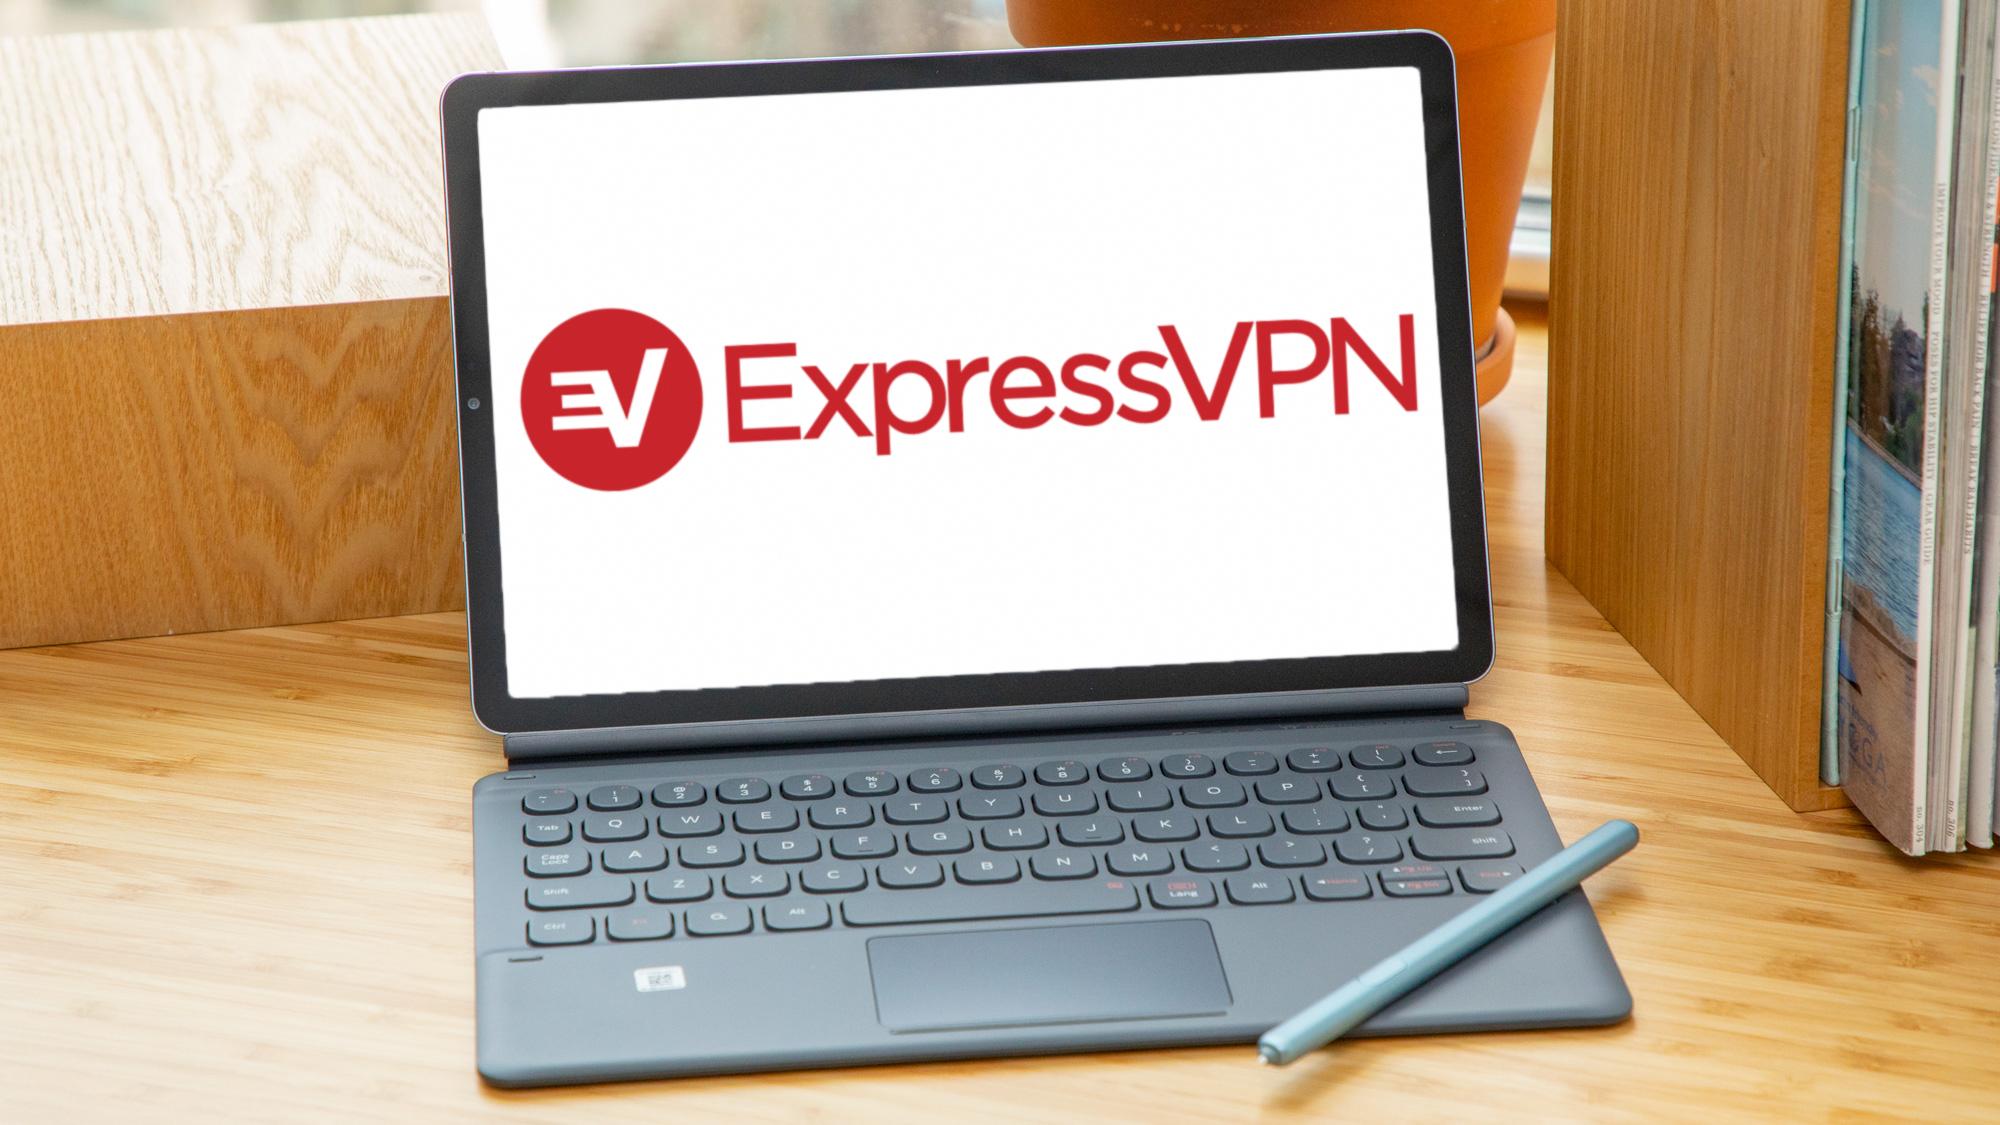 VPN usage soars across the world